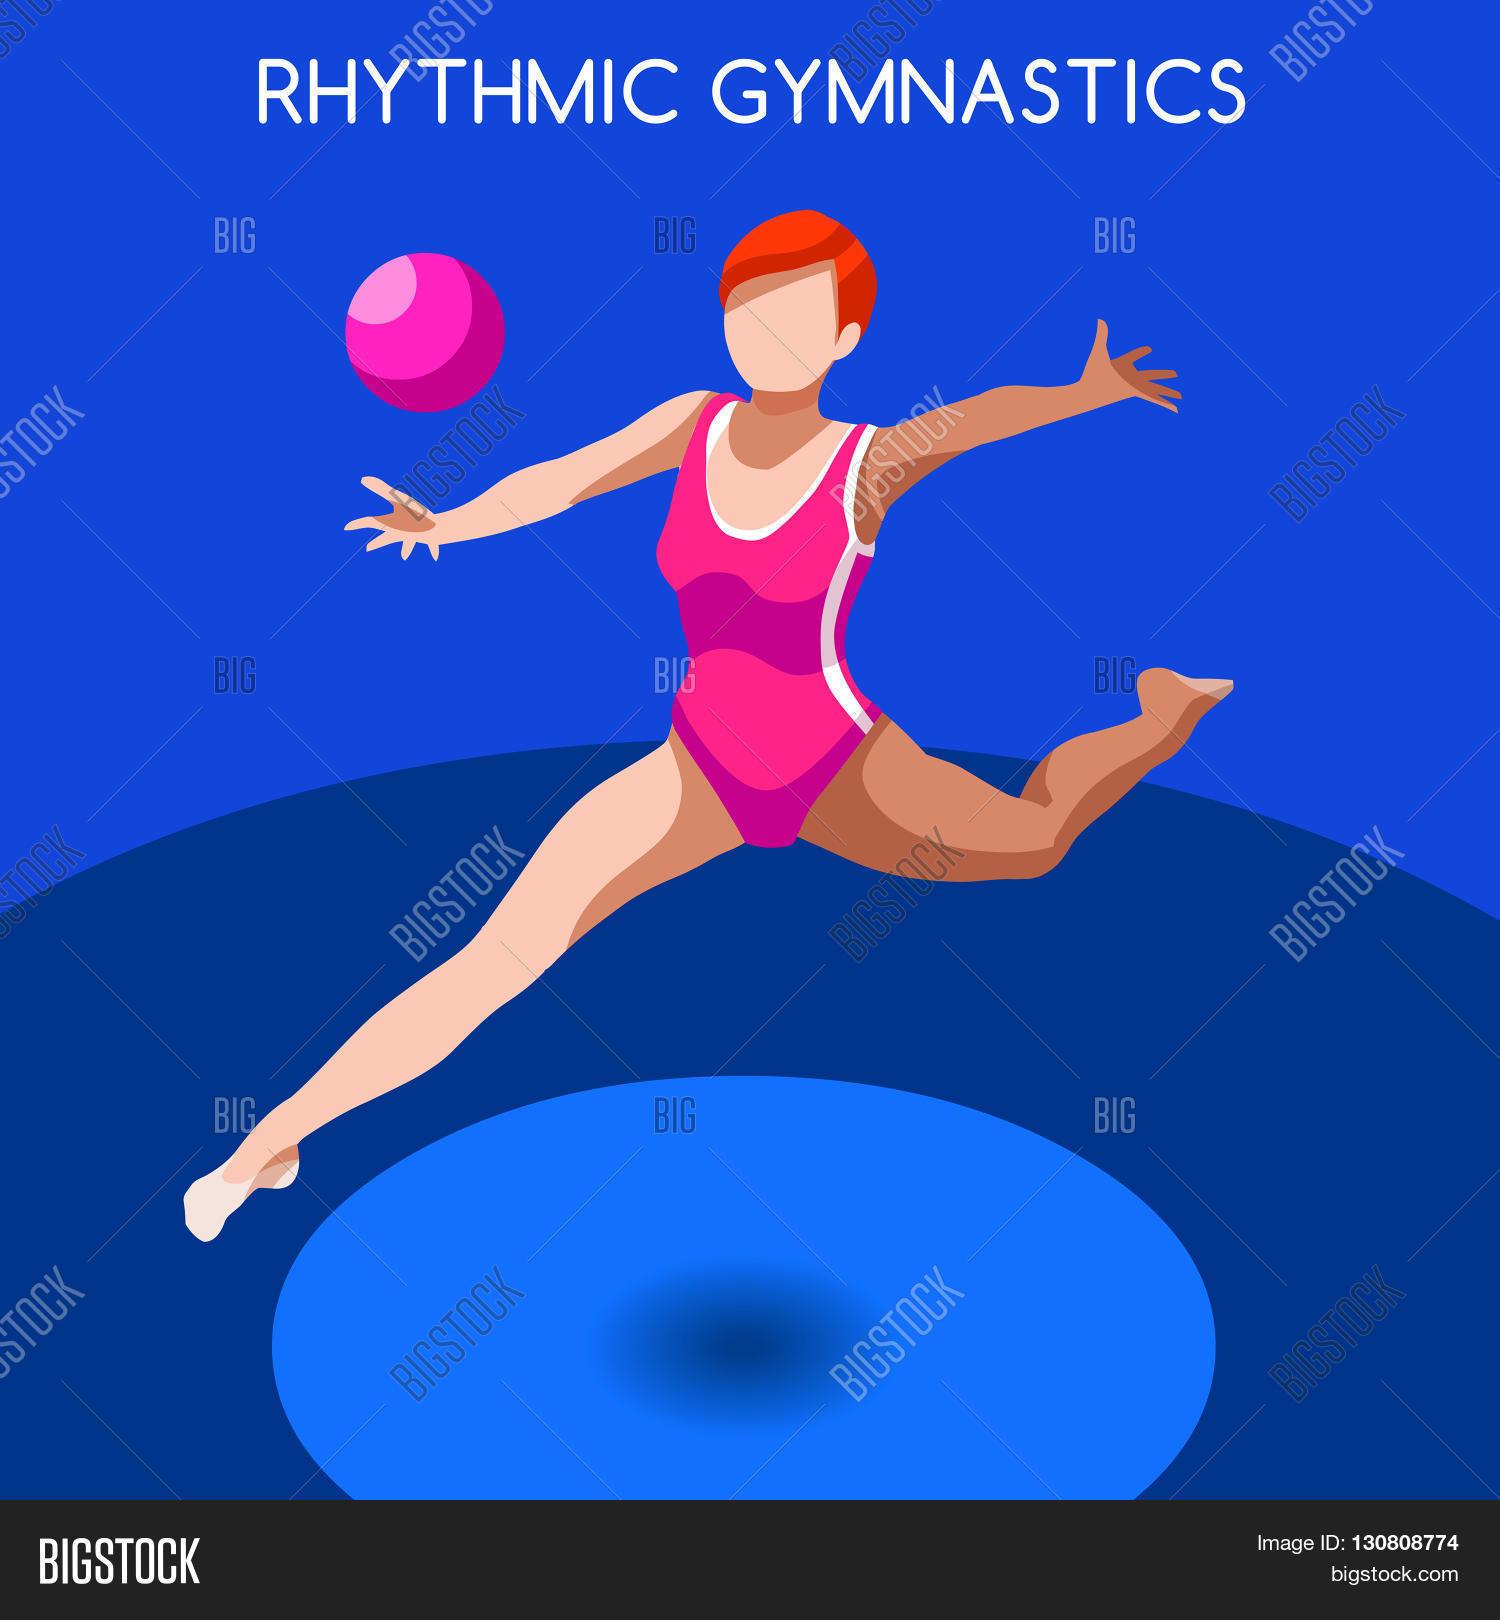 rhythmic gymnastics vector photo